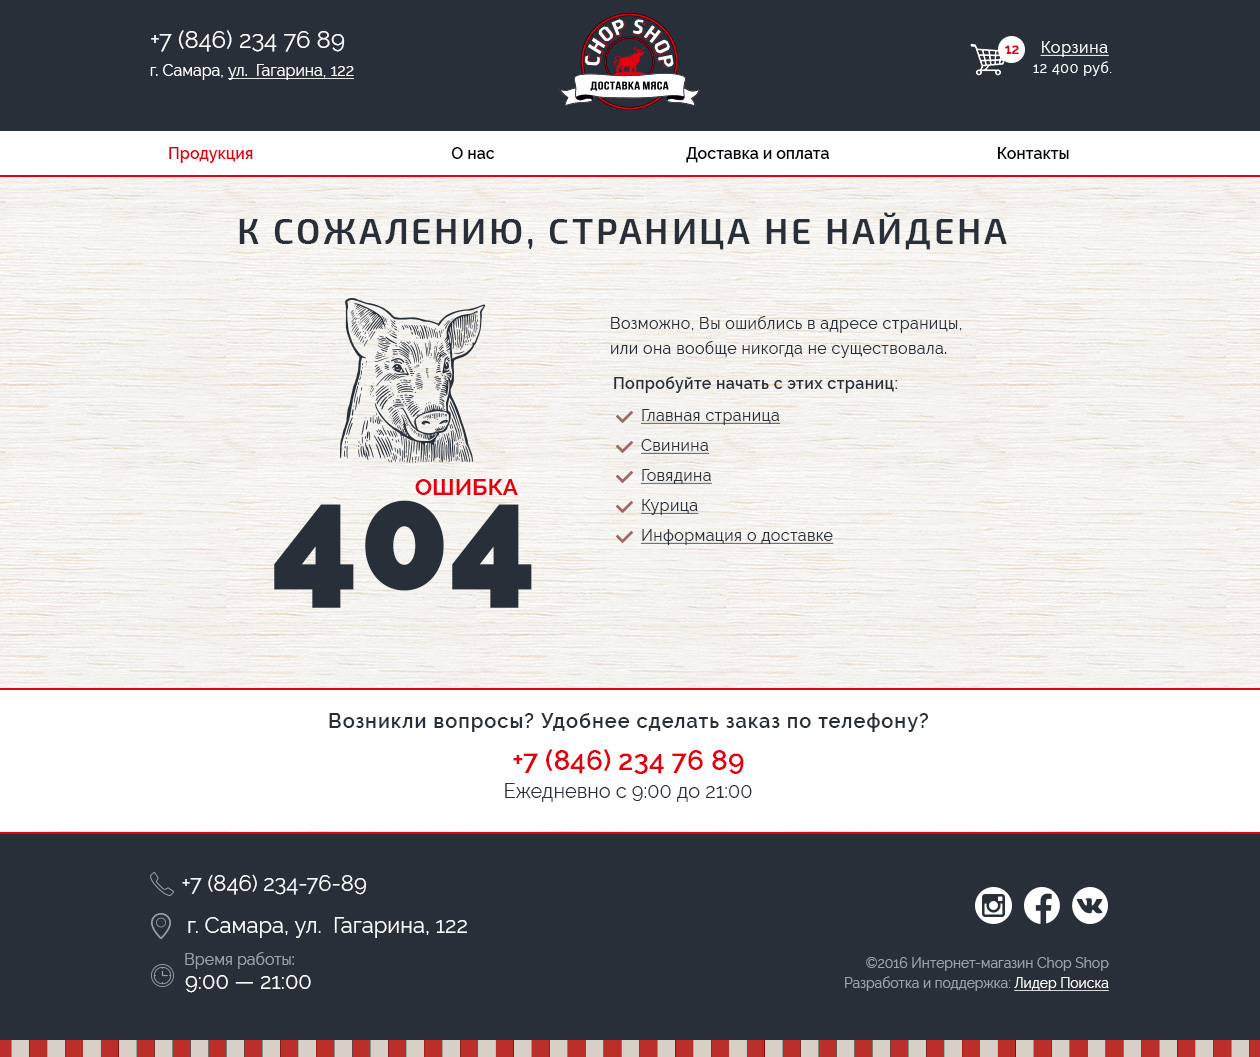 chopshopsamara.ru